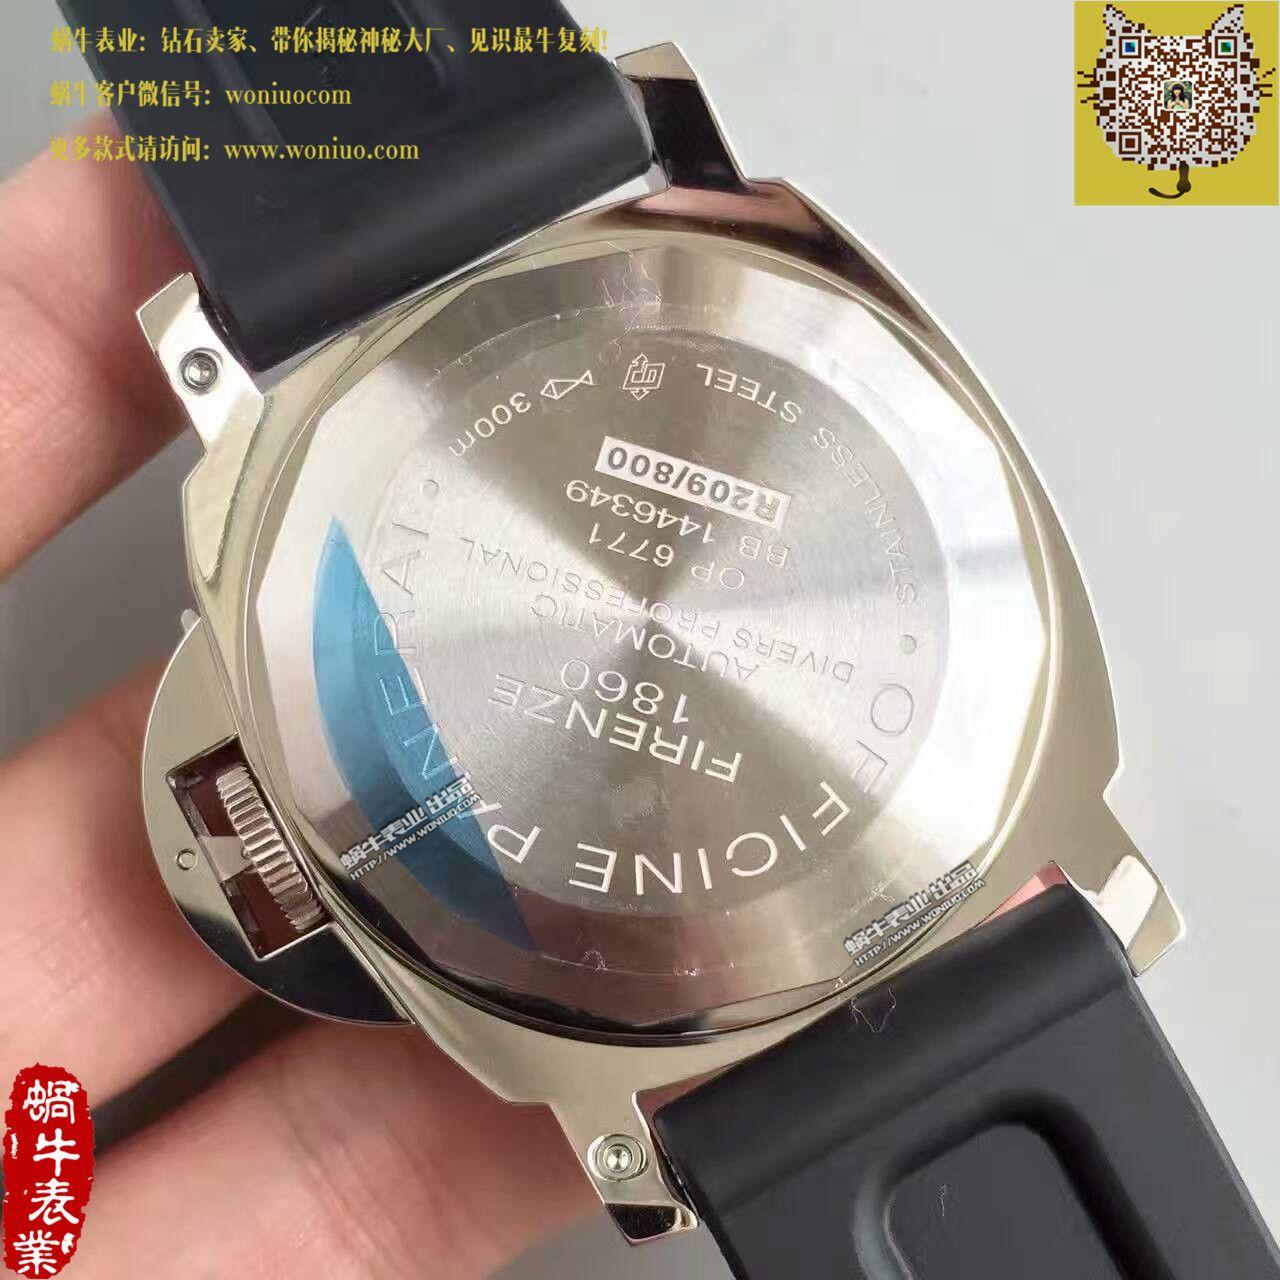 【XF1比1超A复刻手表】沛纳海LUMINOR系列PAM 00024腕表 / PA038